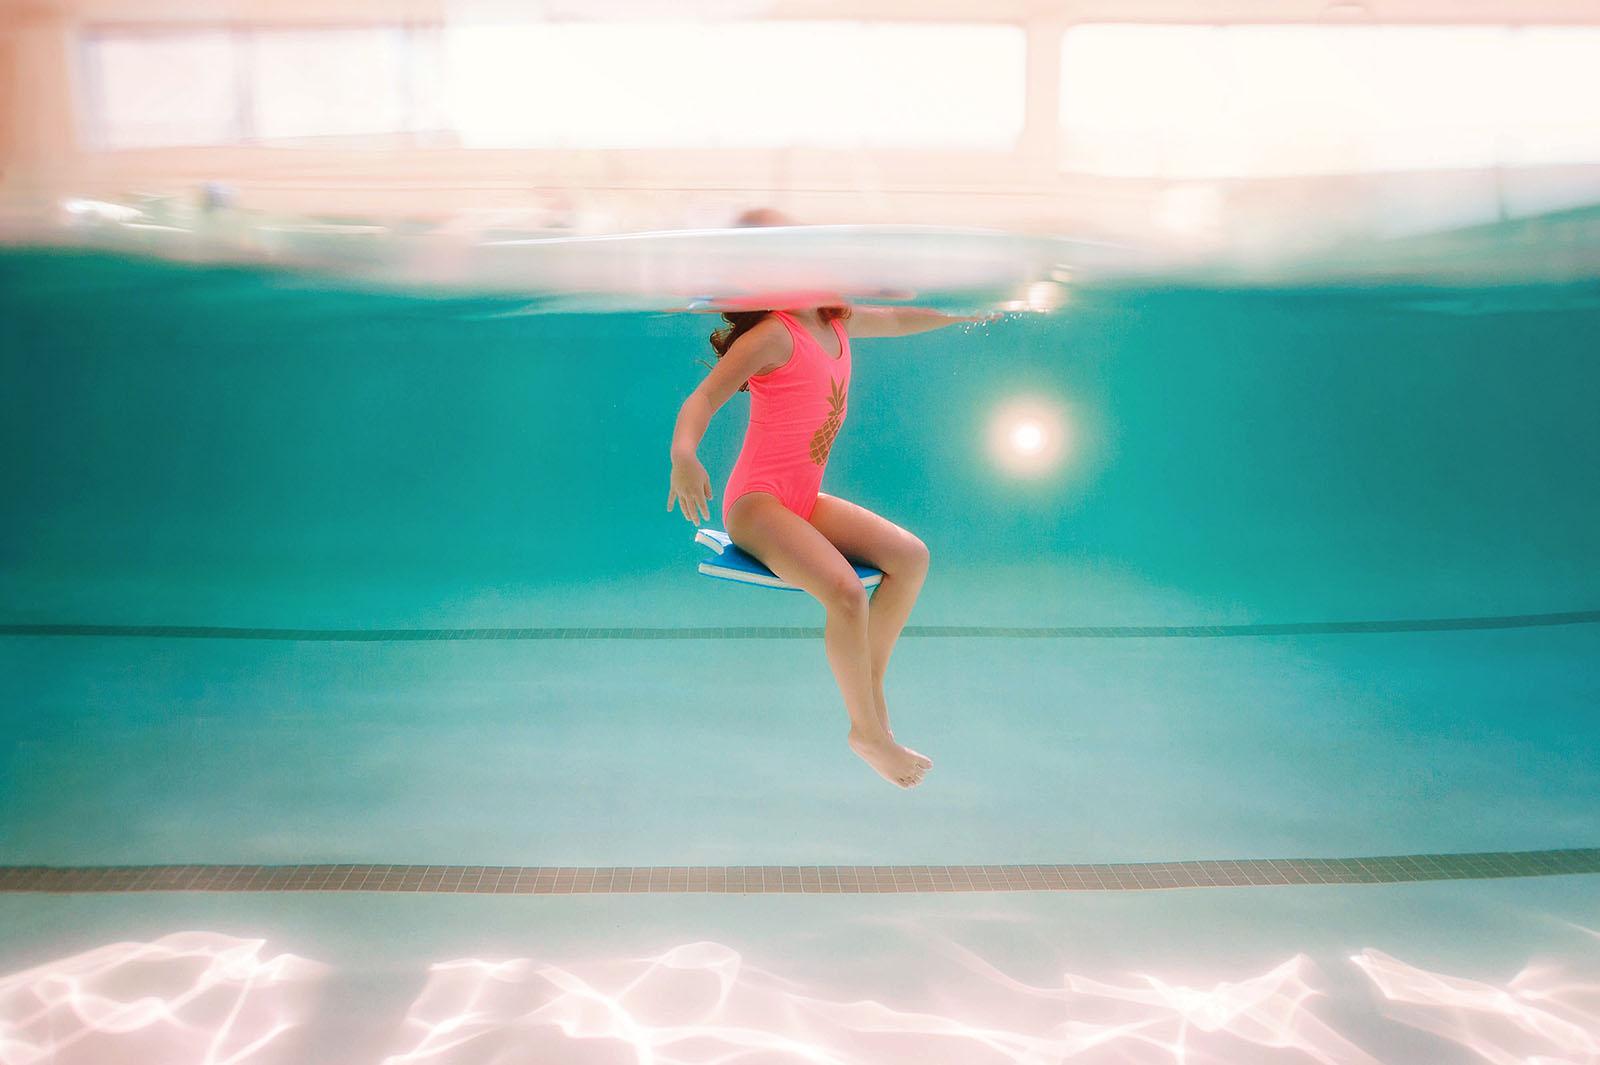 Elizabeth-blank-underwater-photography-06.jpg